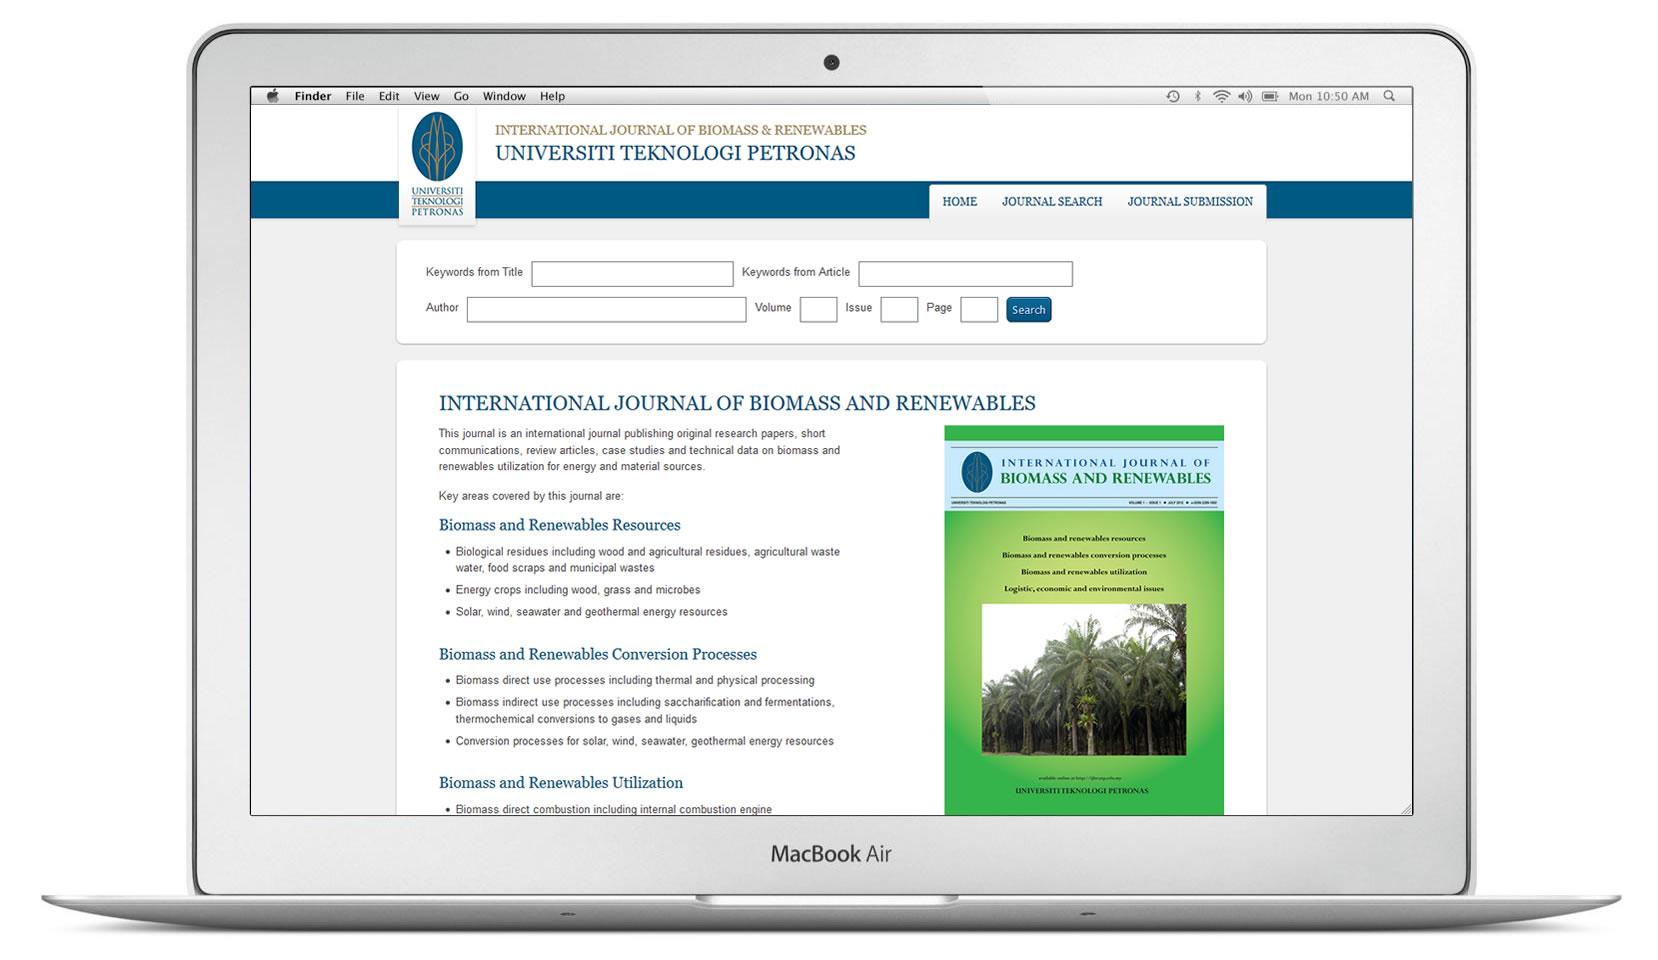 International Journal of Biomass and Renewables